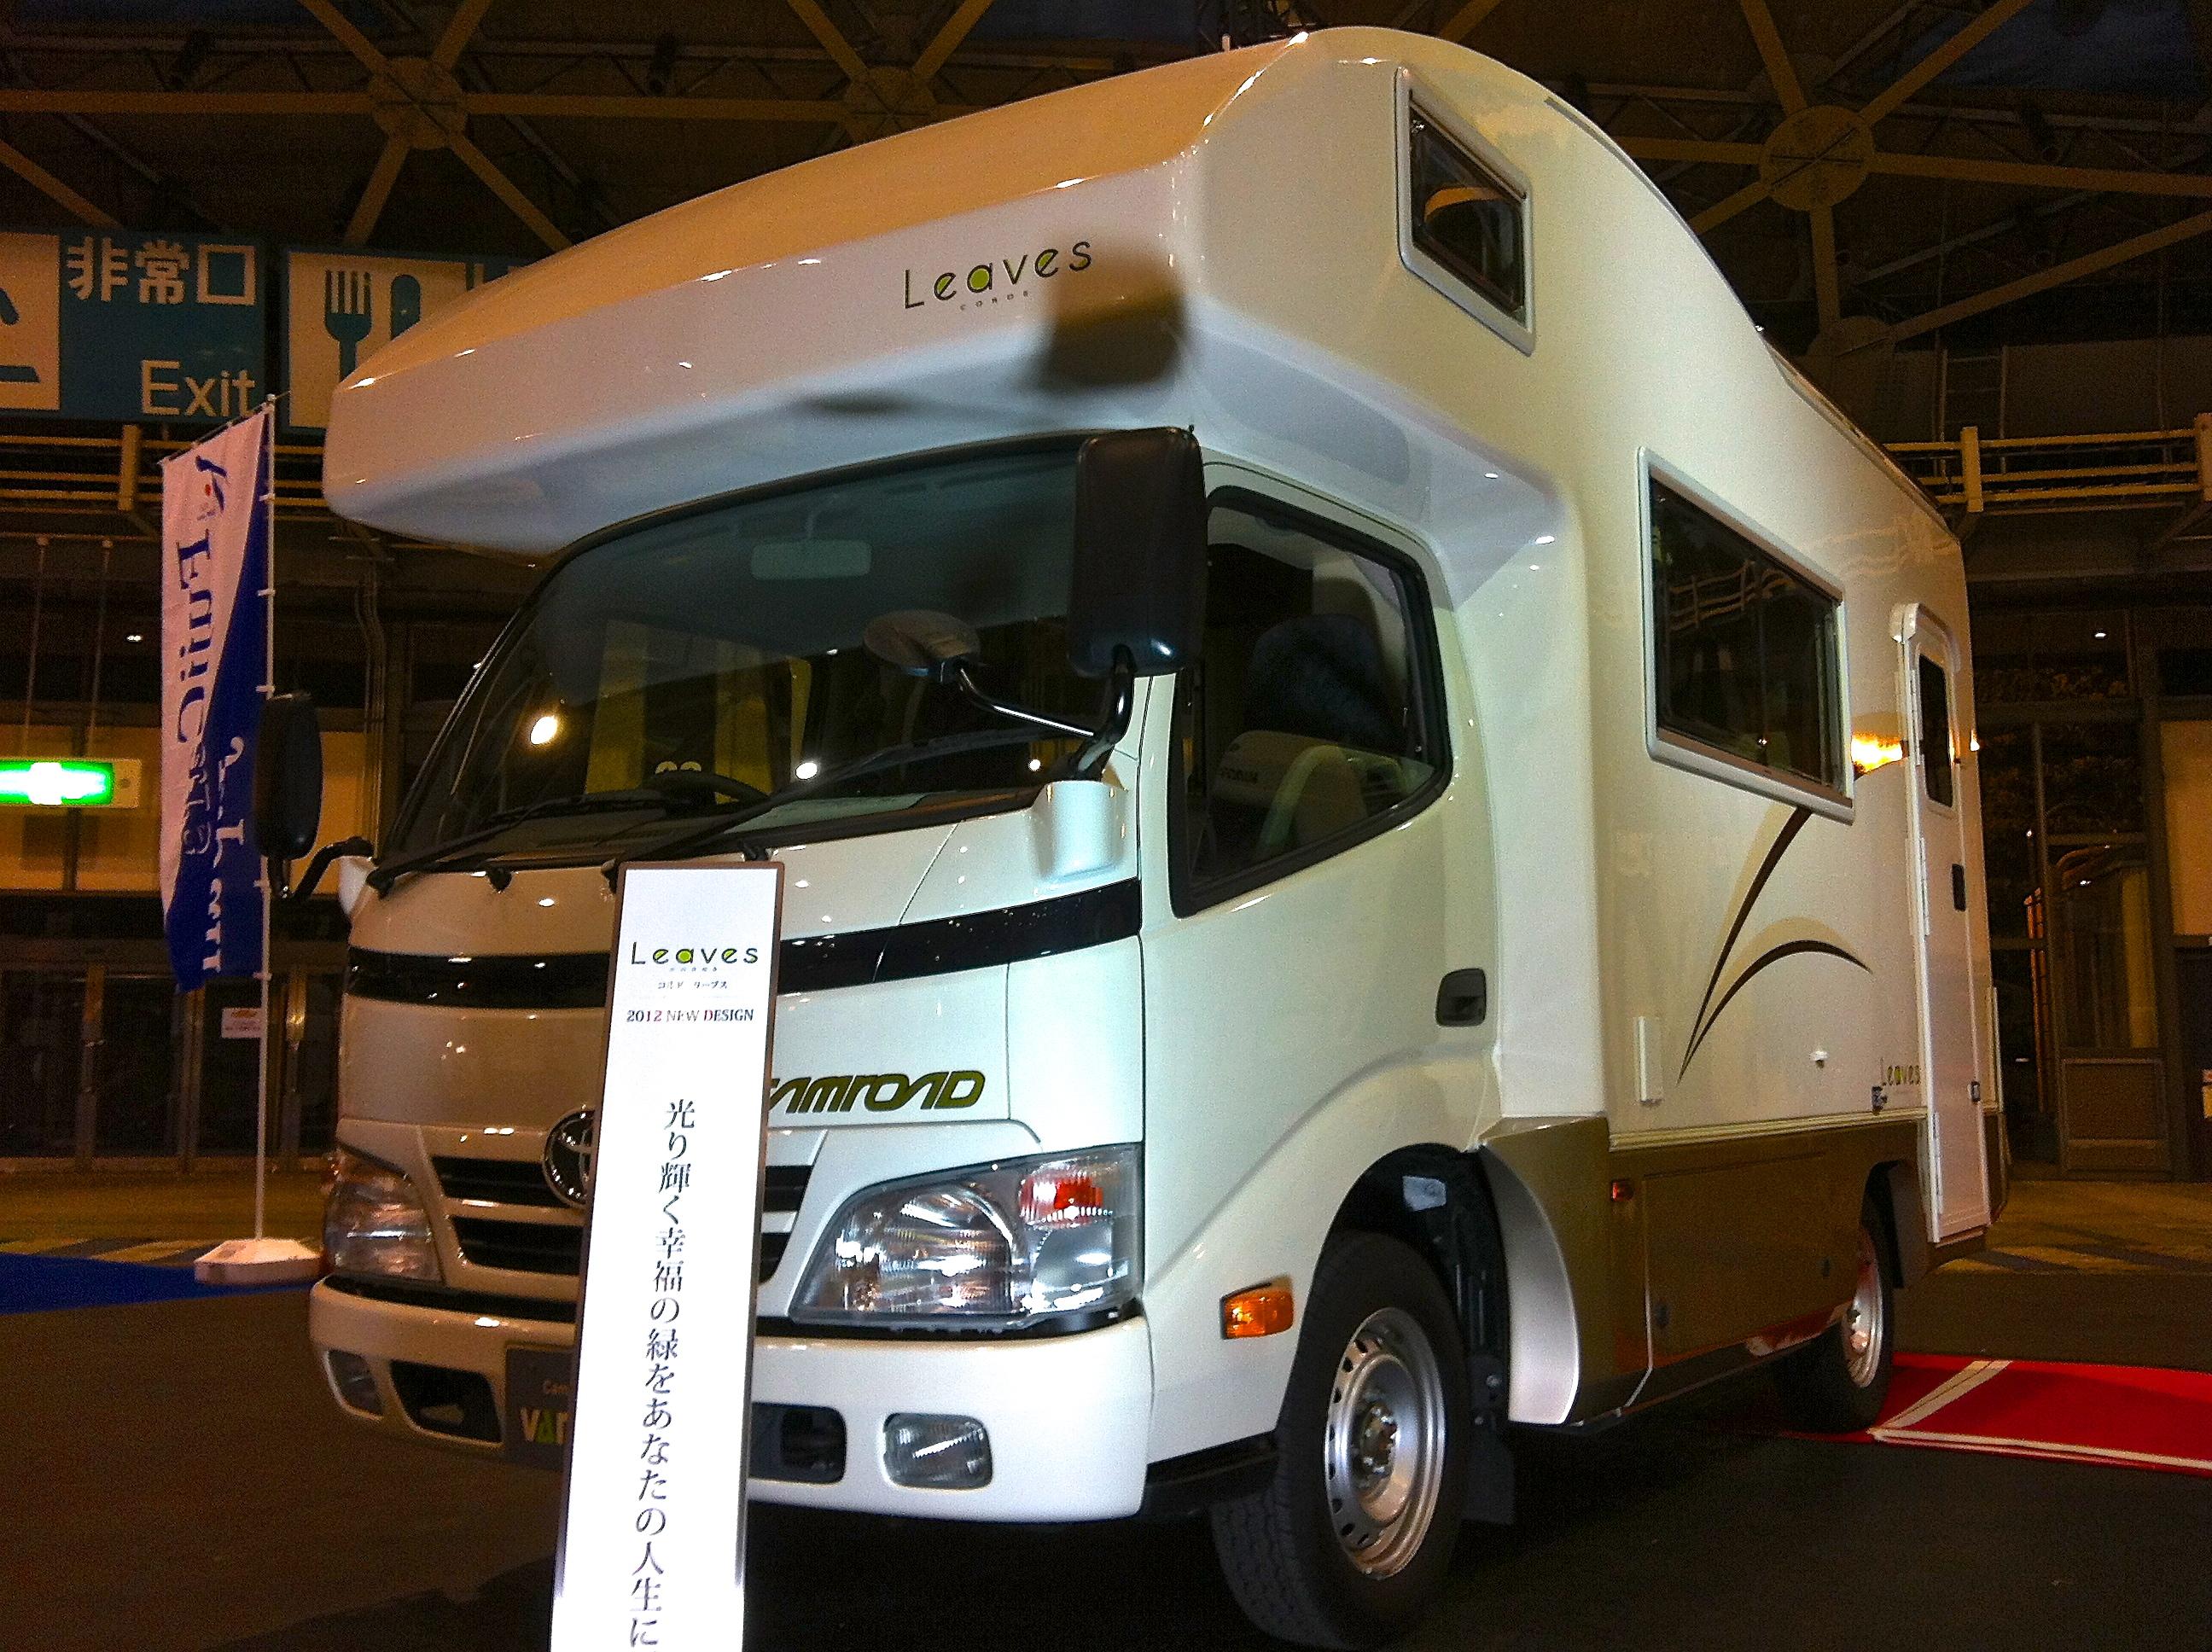 http://www.vantech.jp/shops/info/IMG_0457.JPG